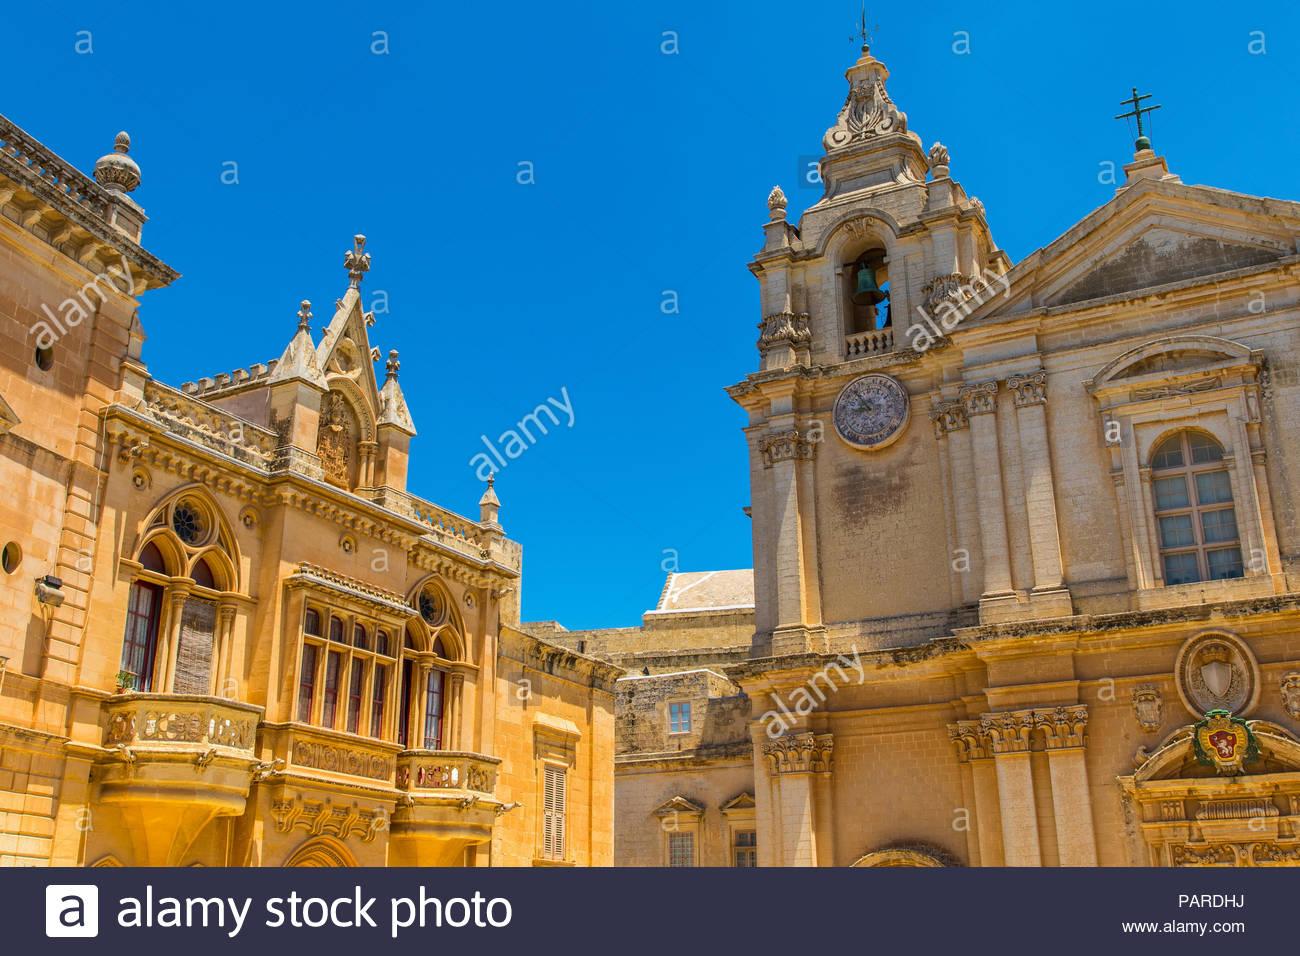 metropolitan cathedral of saint paul in mdina, malta - Stock Image